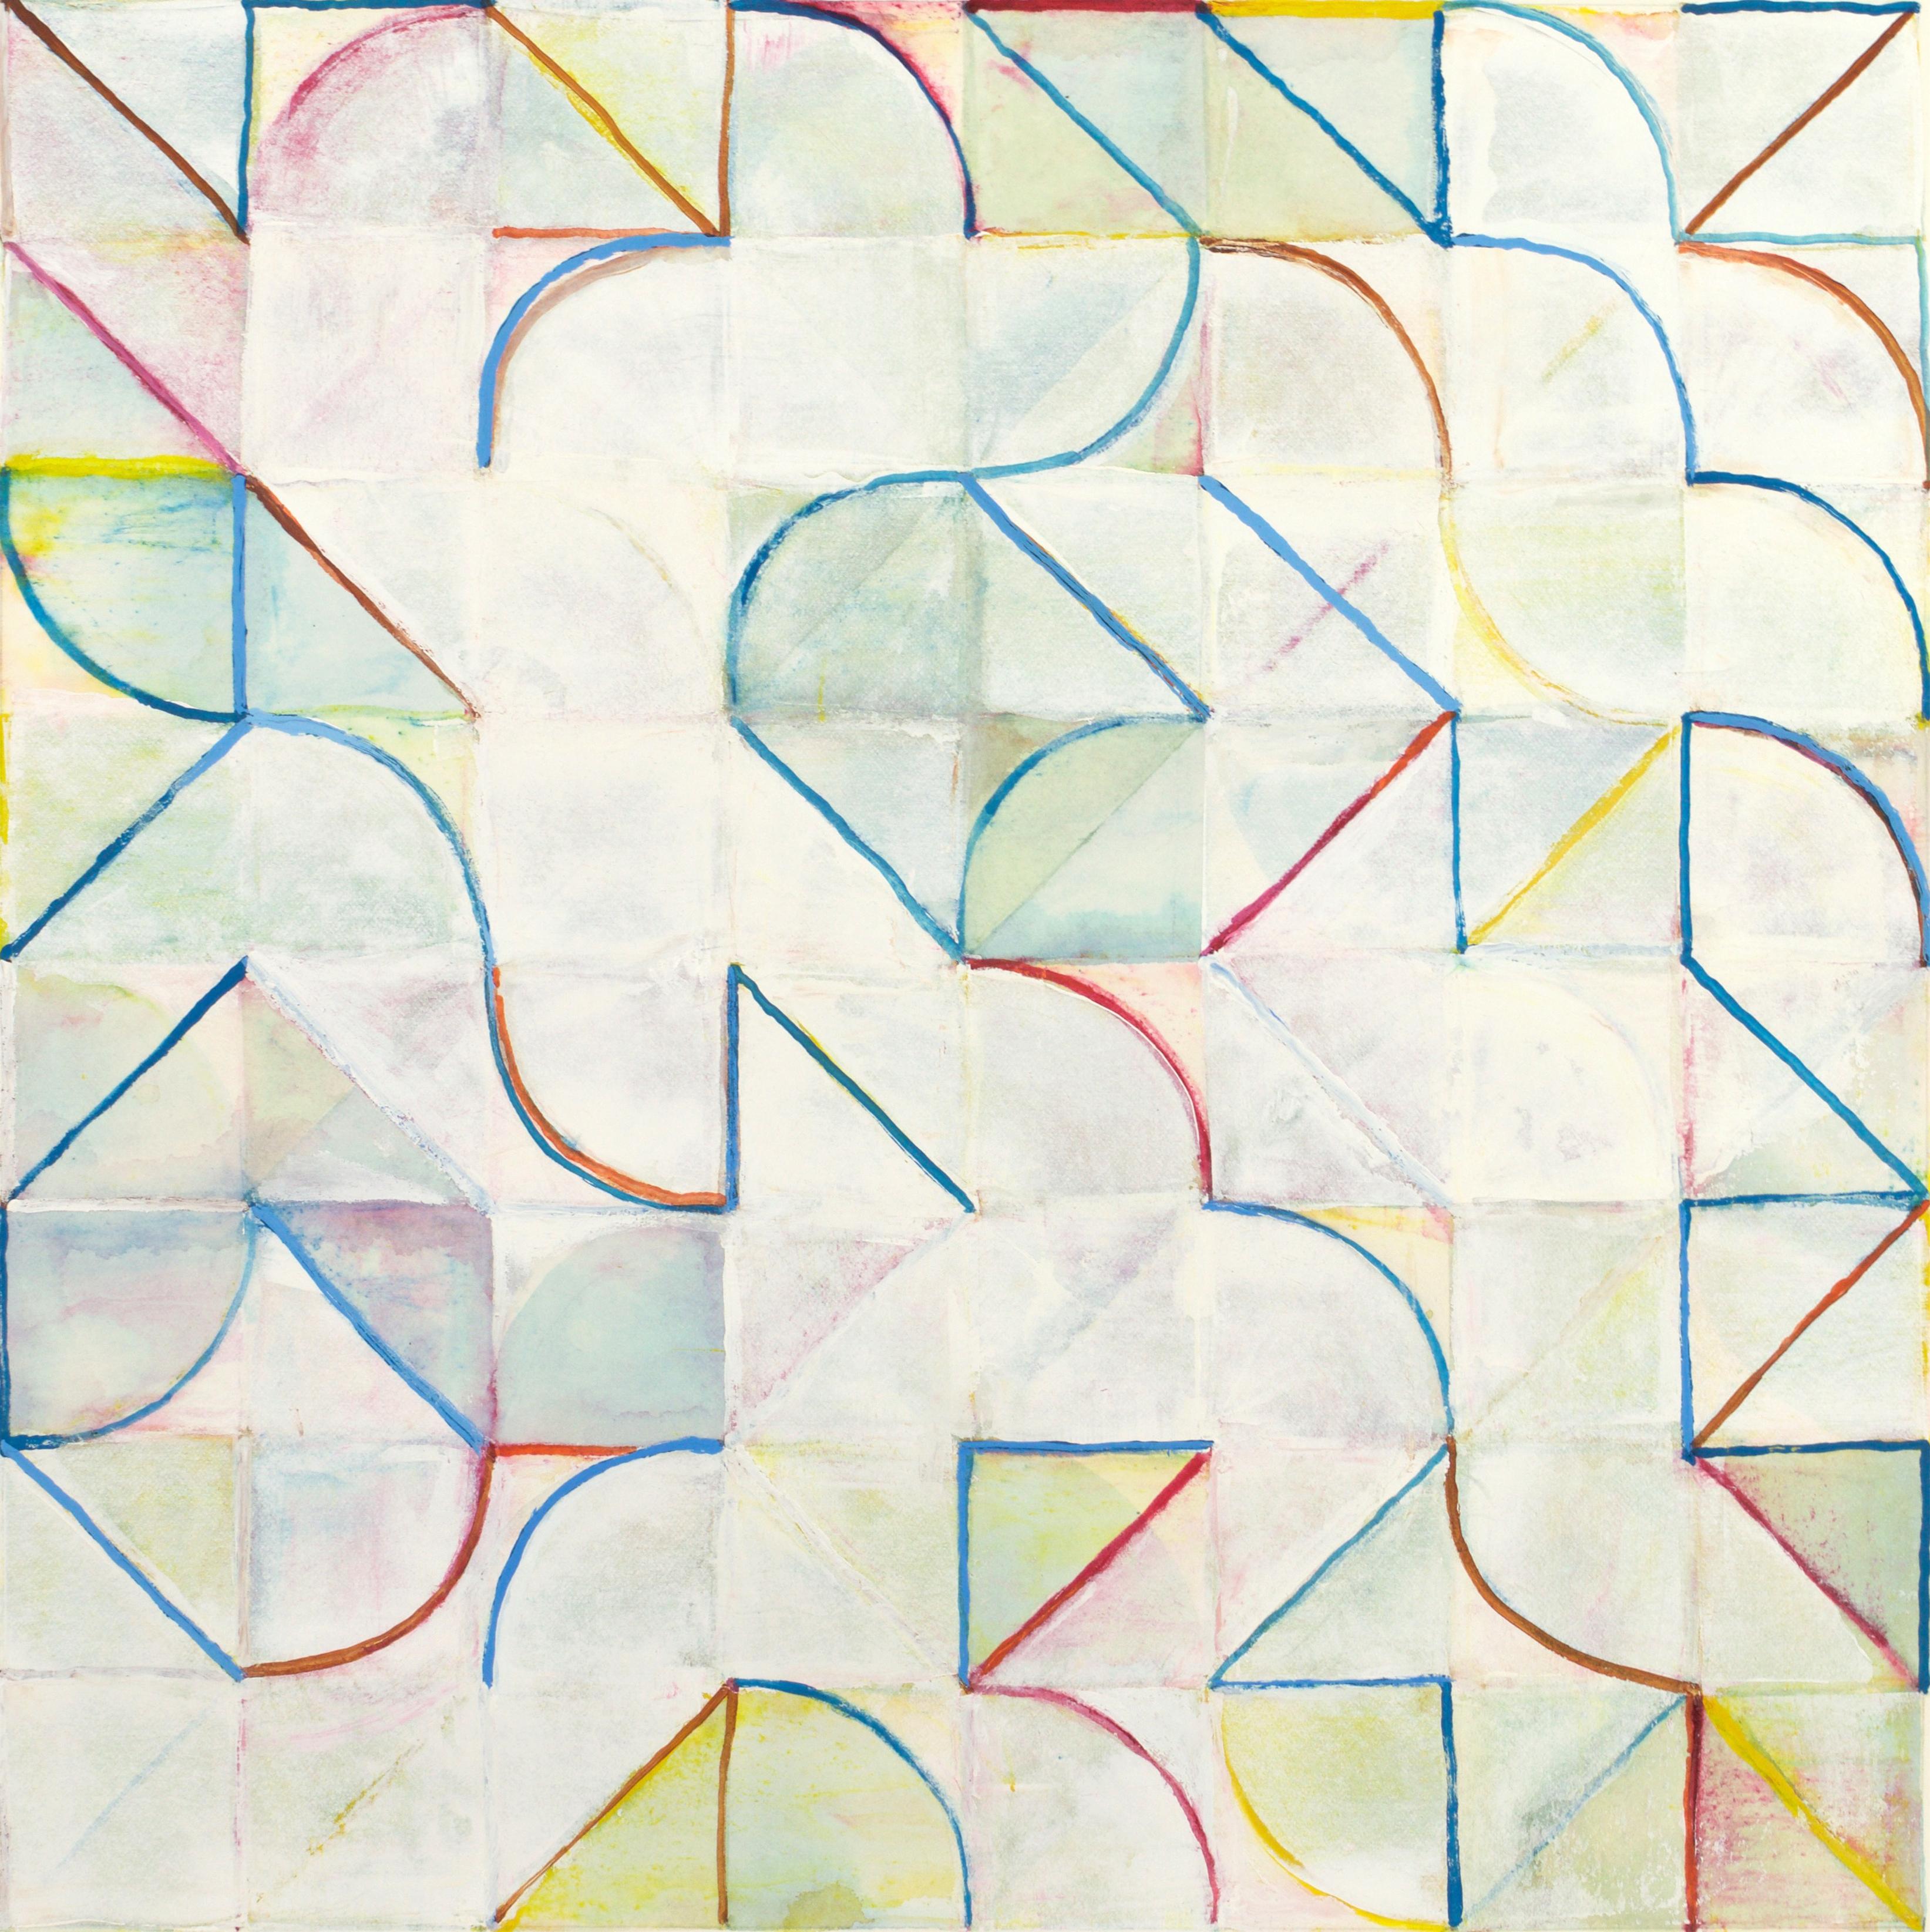 Ellipsis #68, 2016, 15.5x15, Gouache on Paper (Kat Manning Round 2)